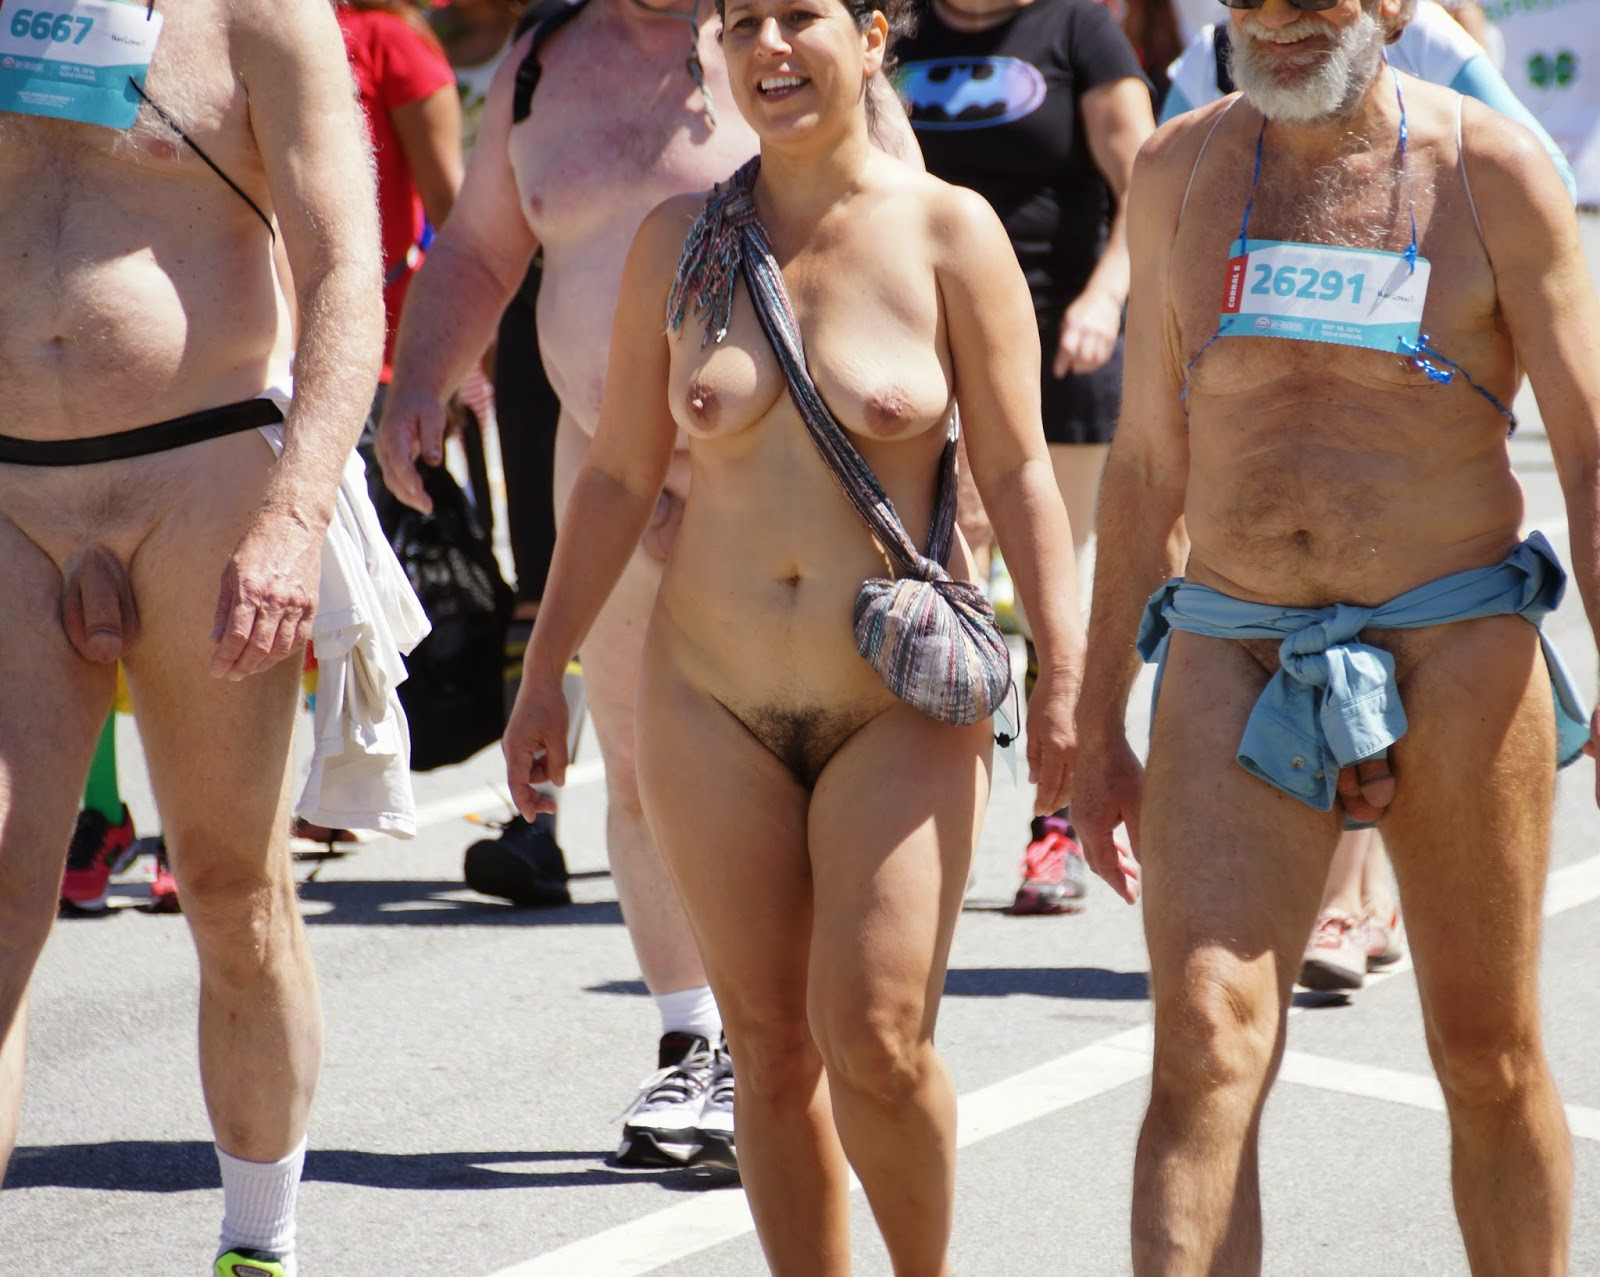 Rather good Bay breakers nude